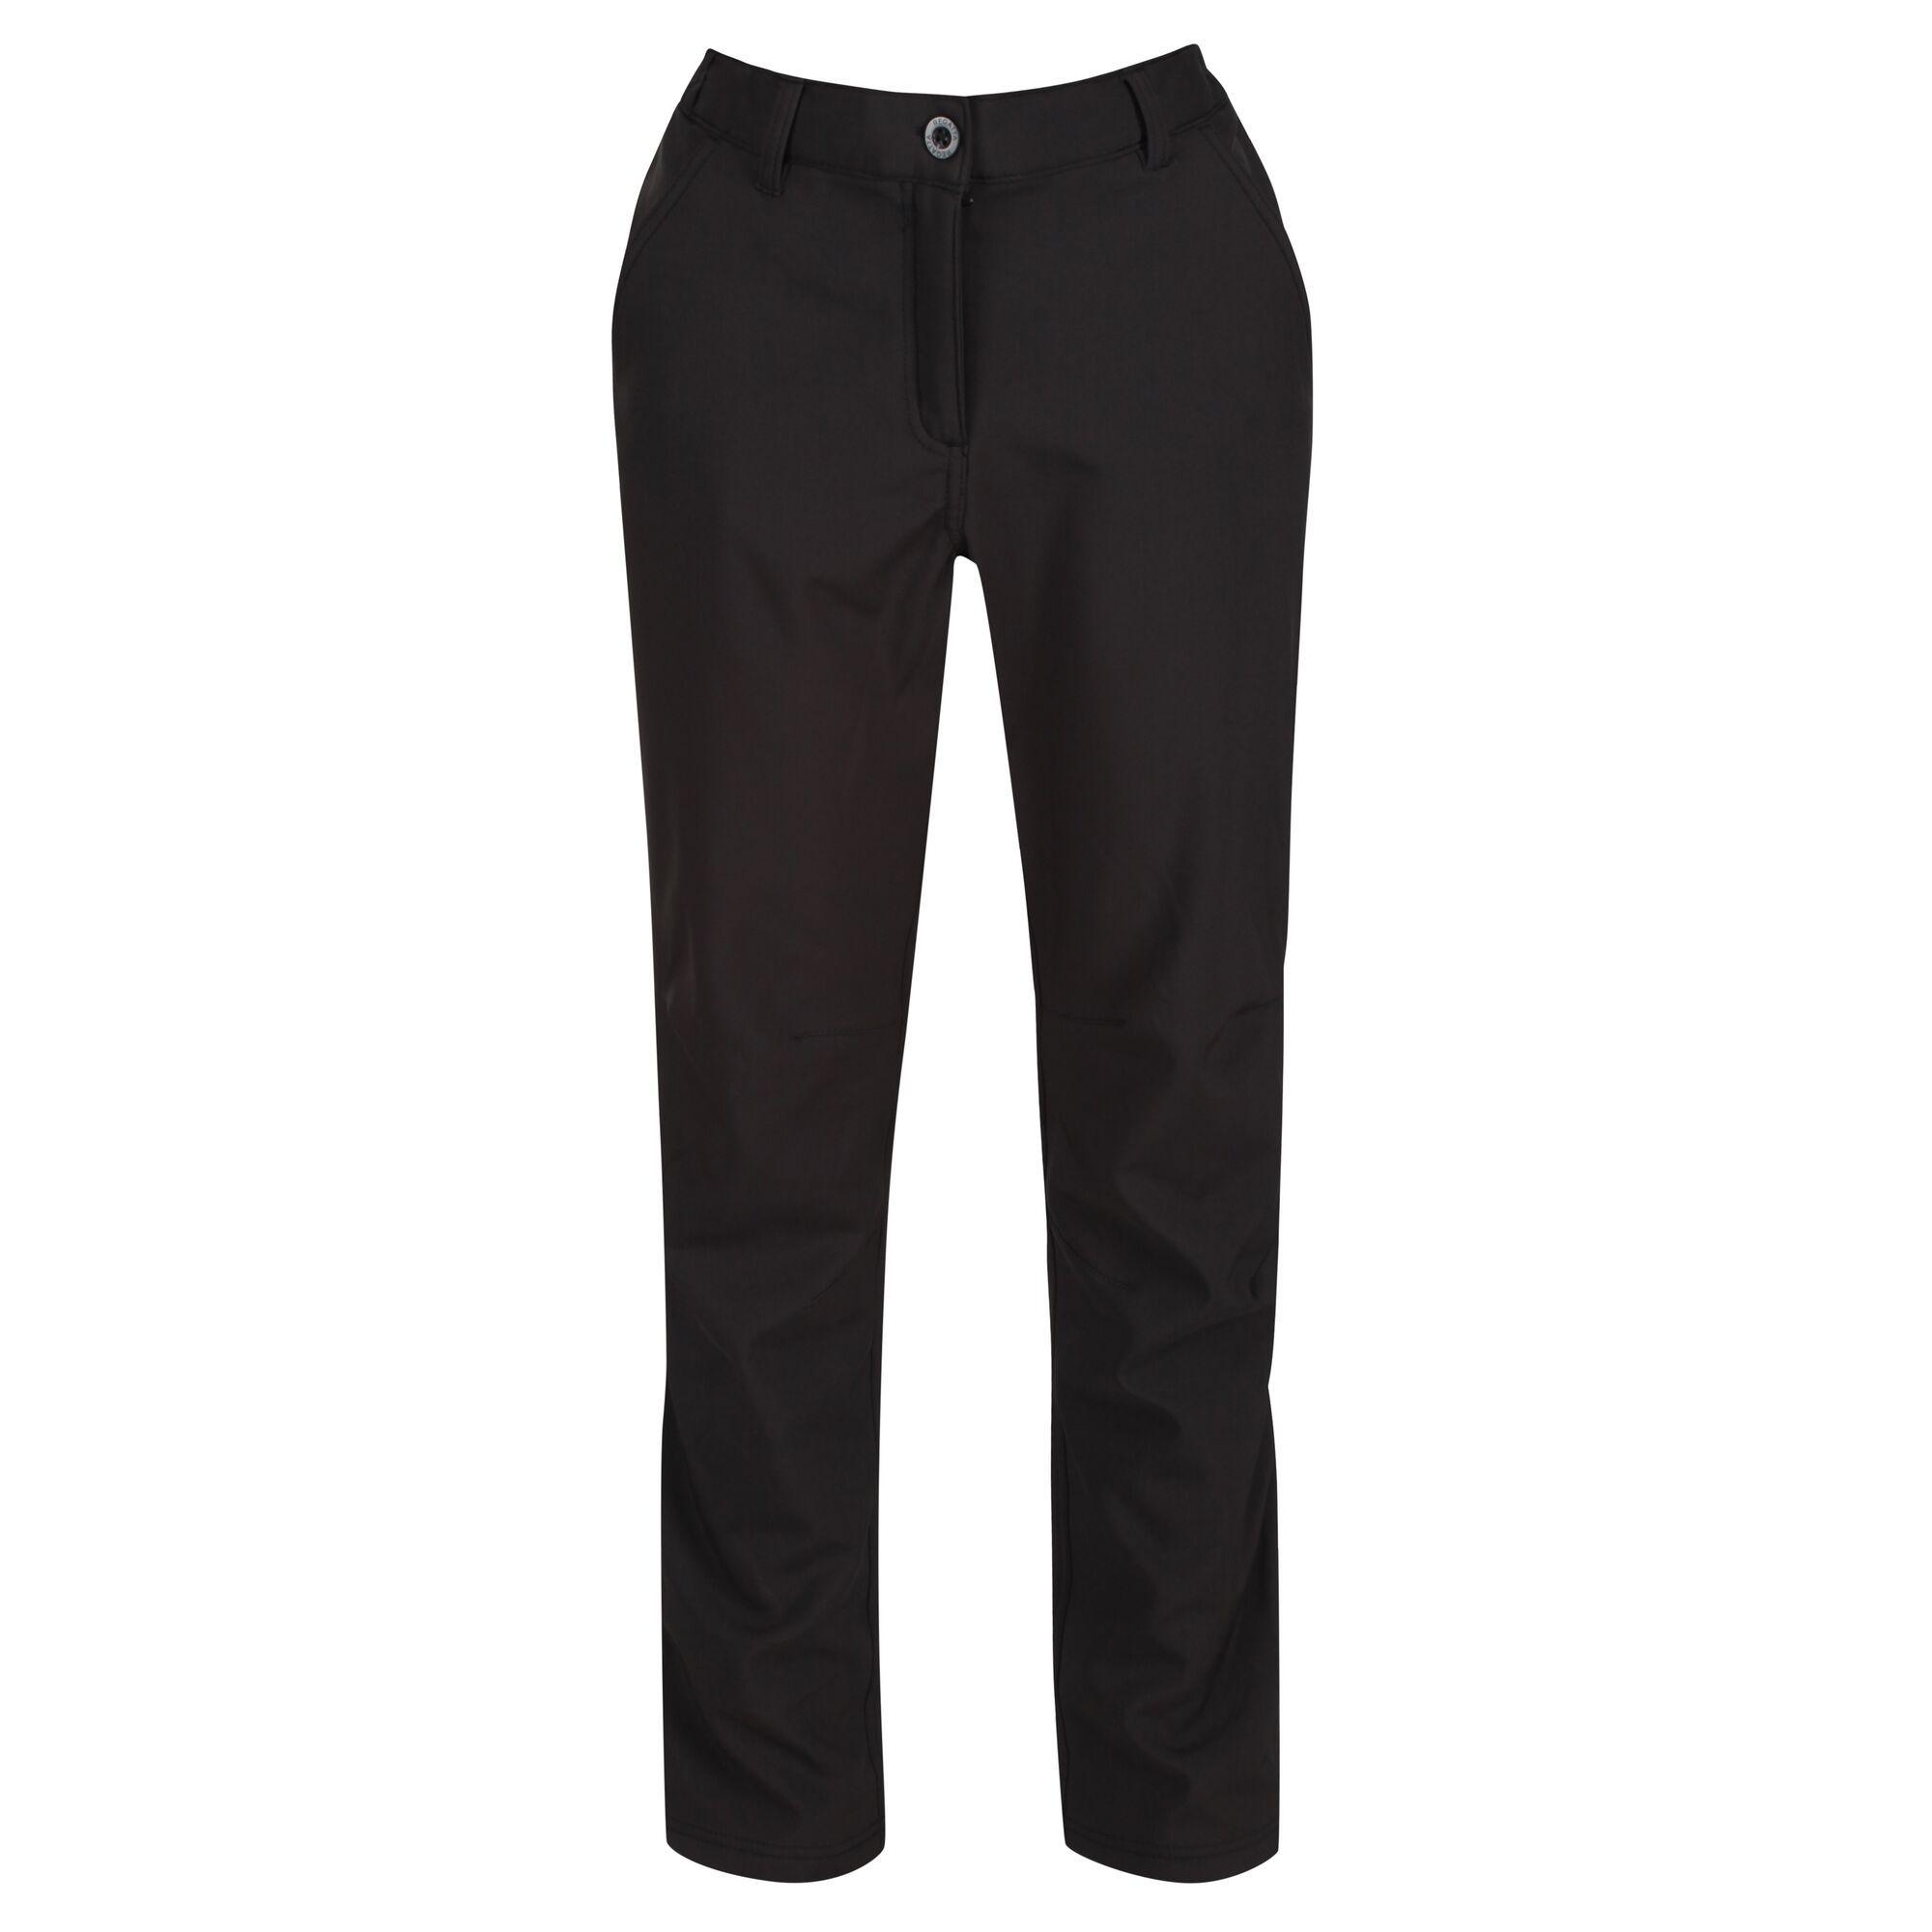 Regatta-Great-Outdoors-Womens-Ladies-Fenton-Softshell-Walking-Trousers-RG2198